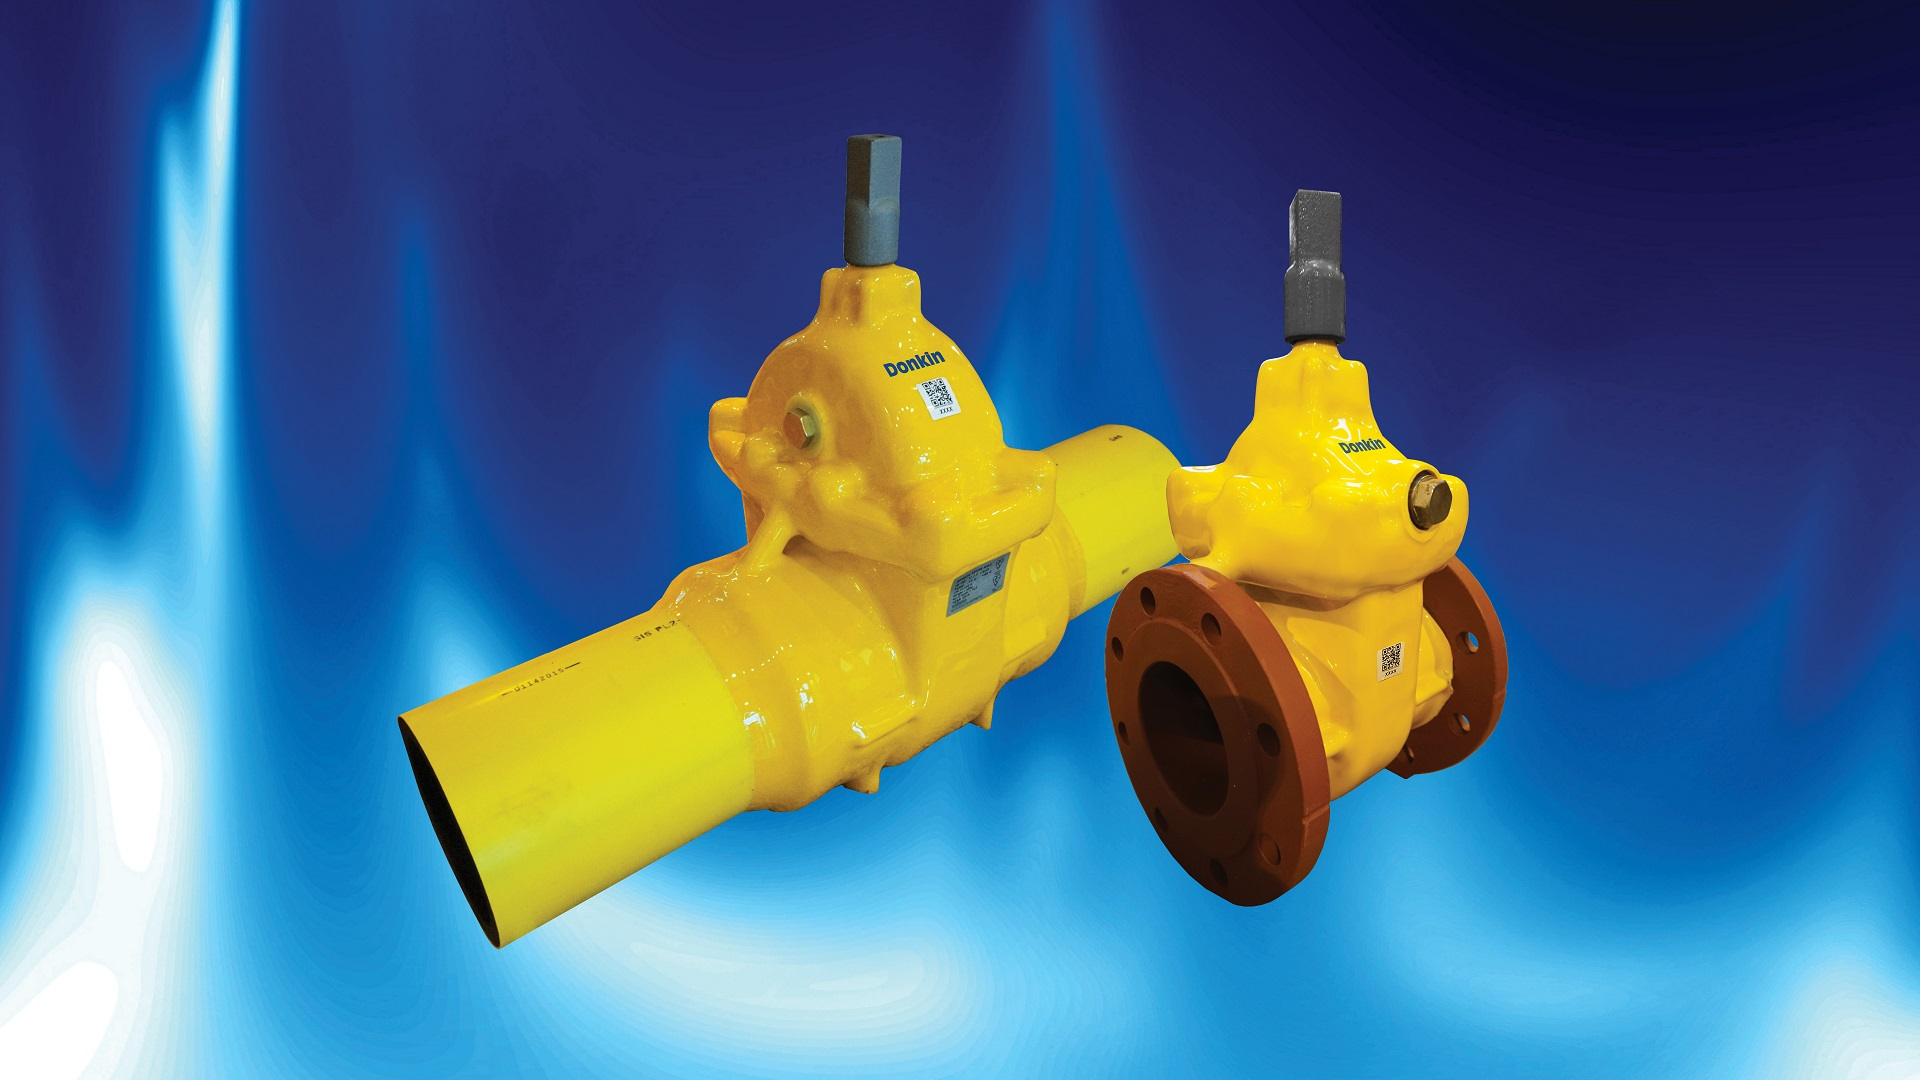 AVK Donkin PUR coated valves